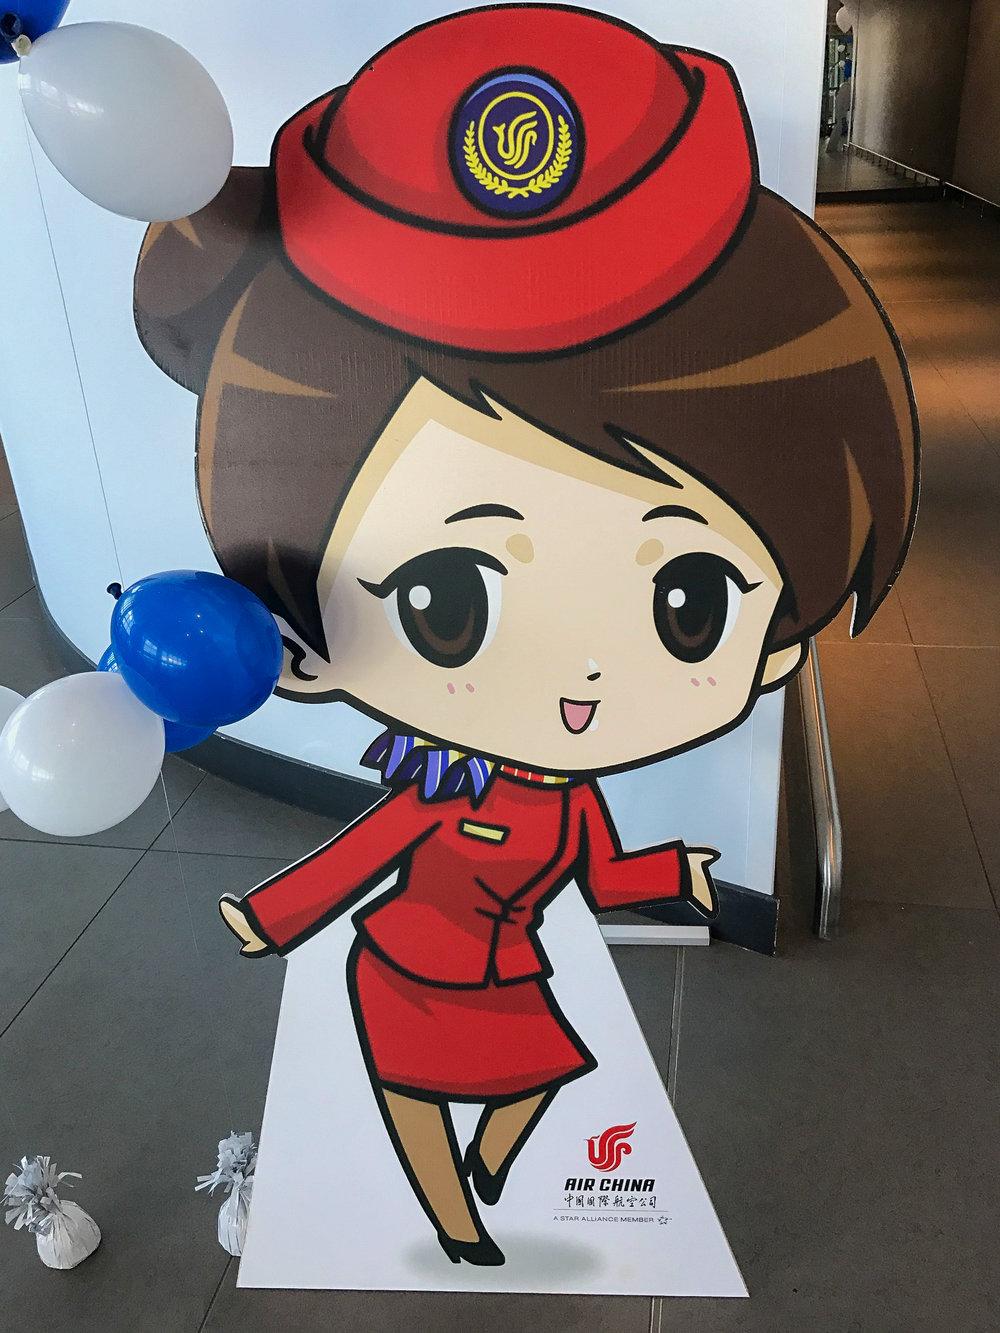 Air China Website 22 (1 of 1).jpg